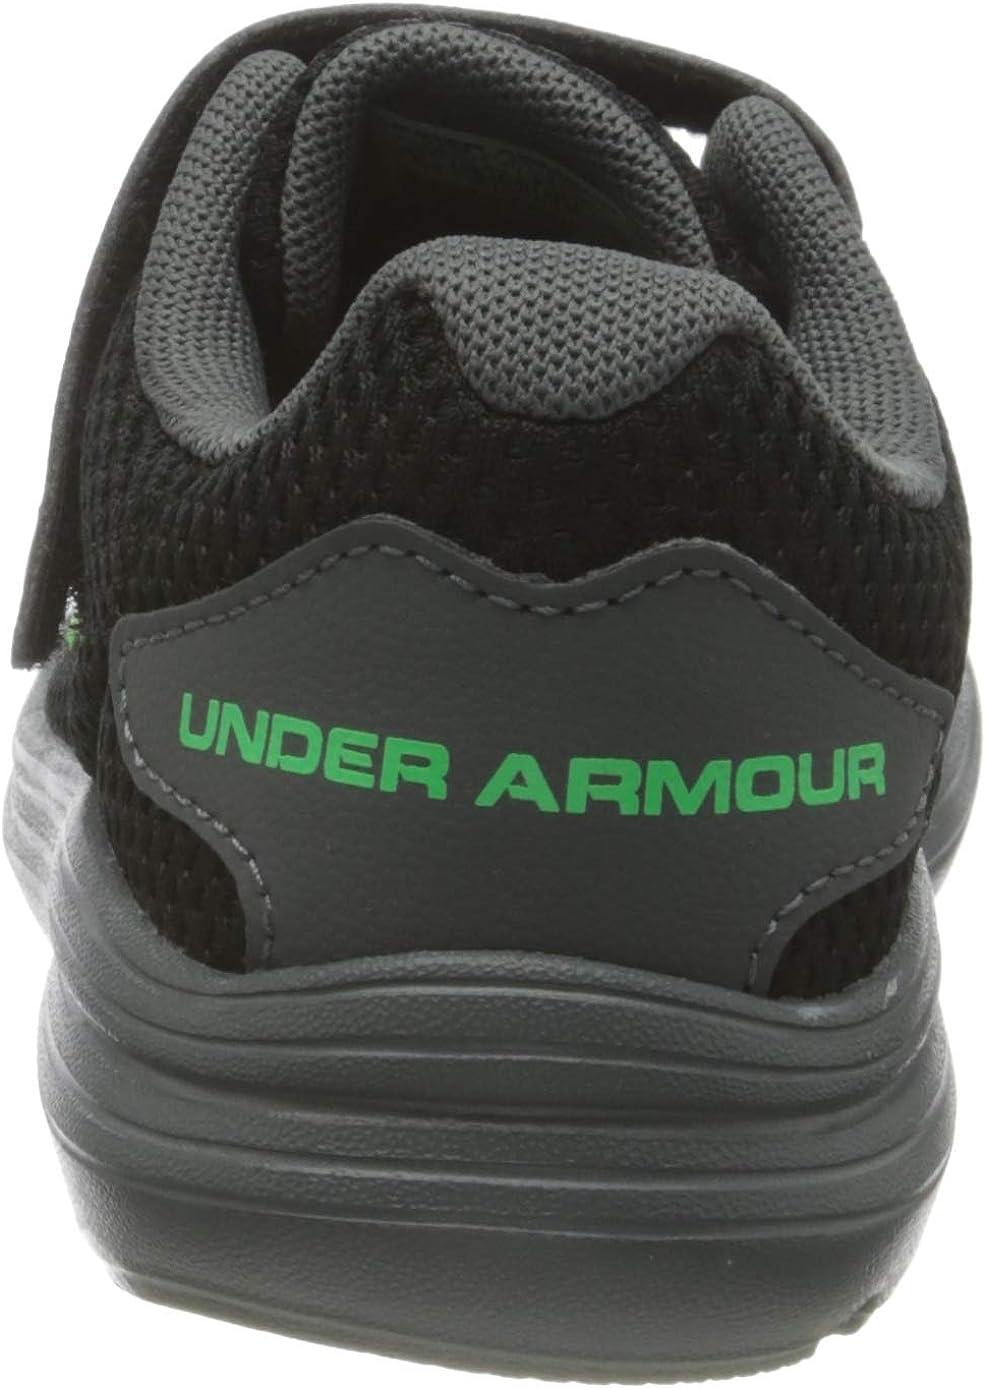 Under Armour Pre School Surge 2 AC Scarpe per Jogging su Strada Unisex-Bambini